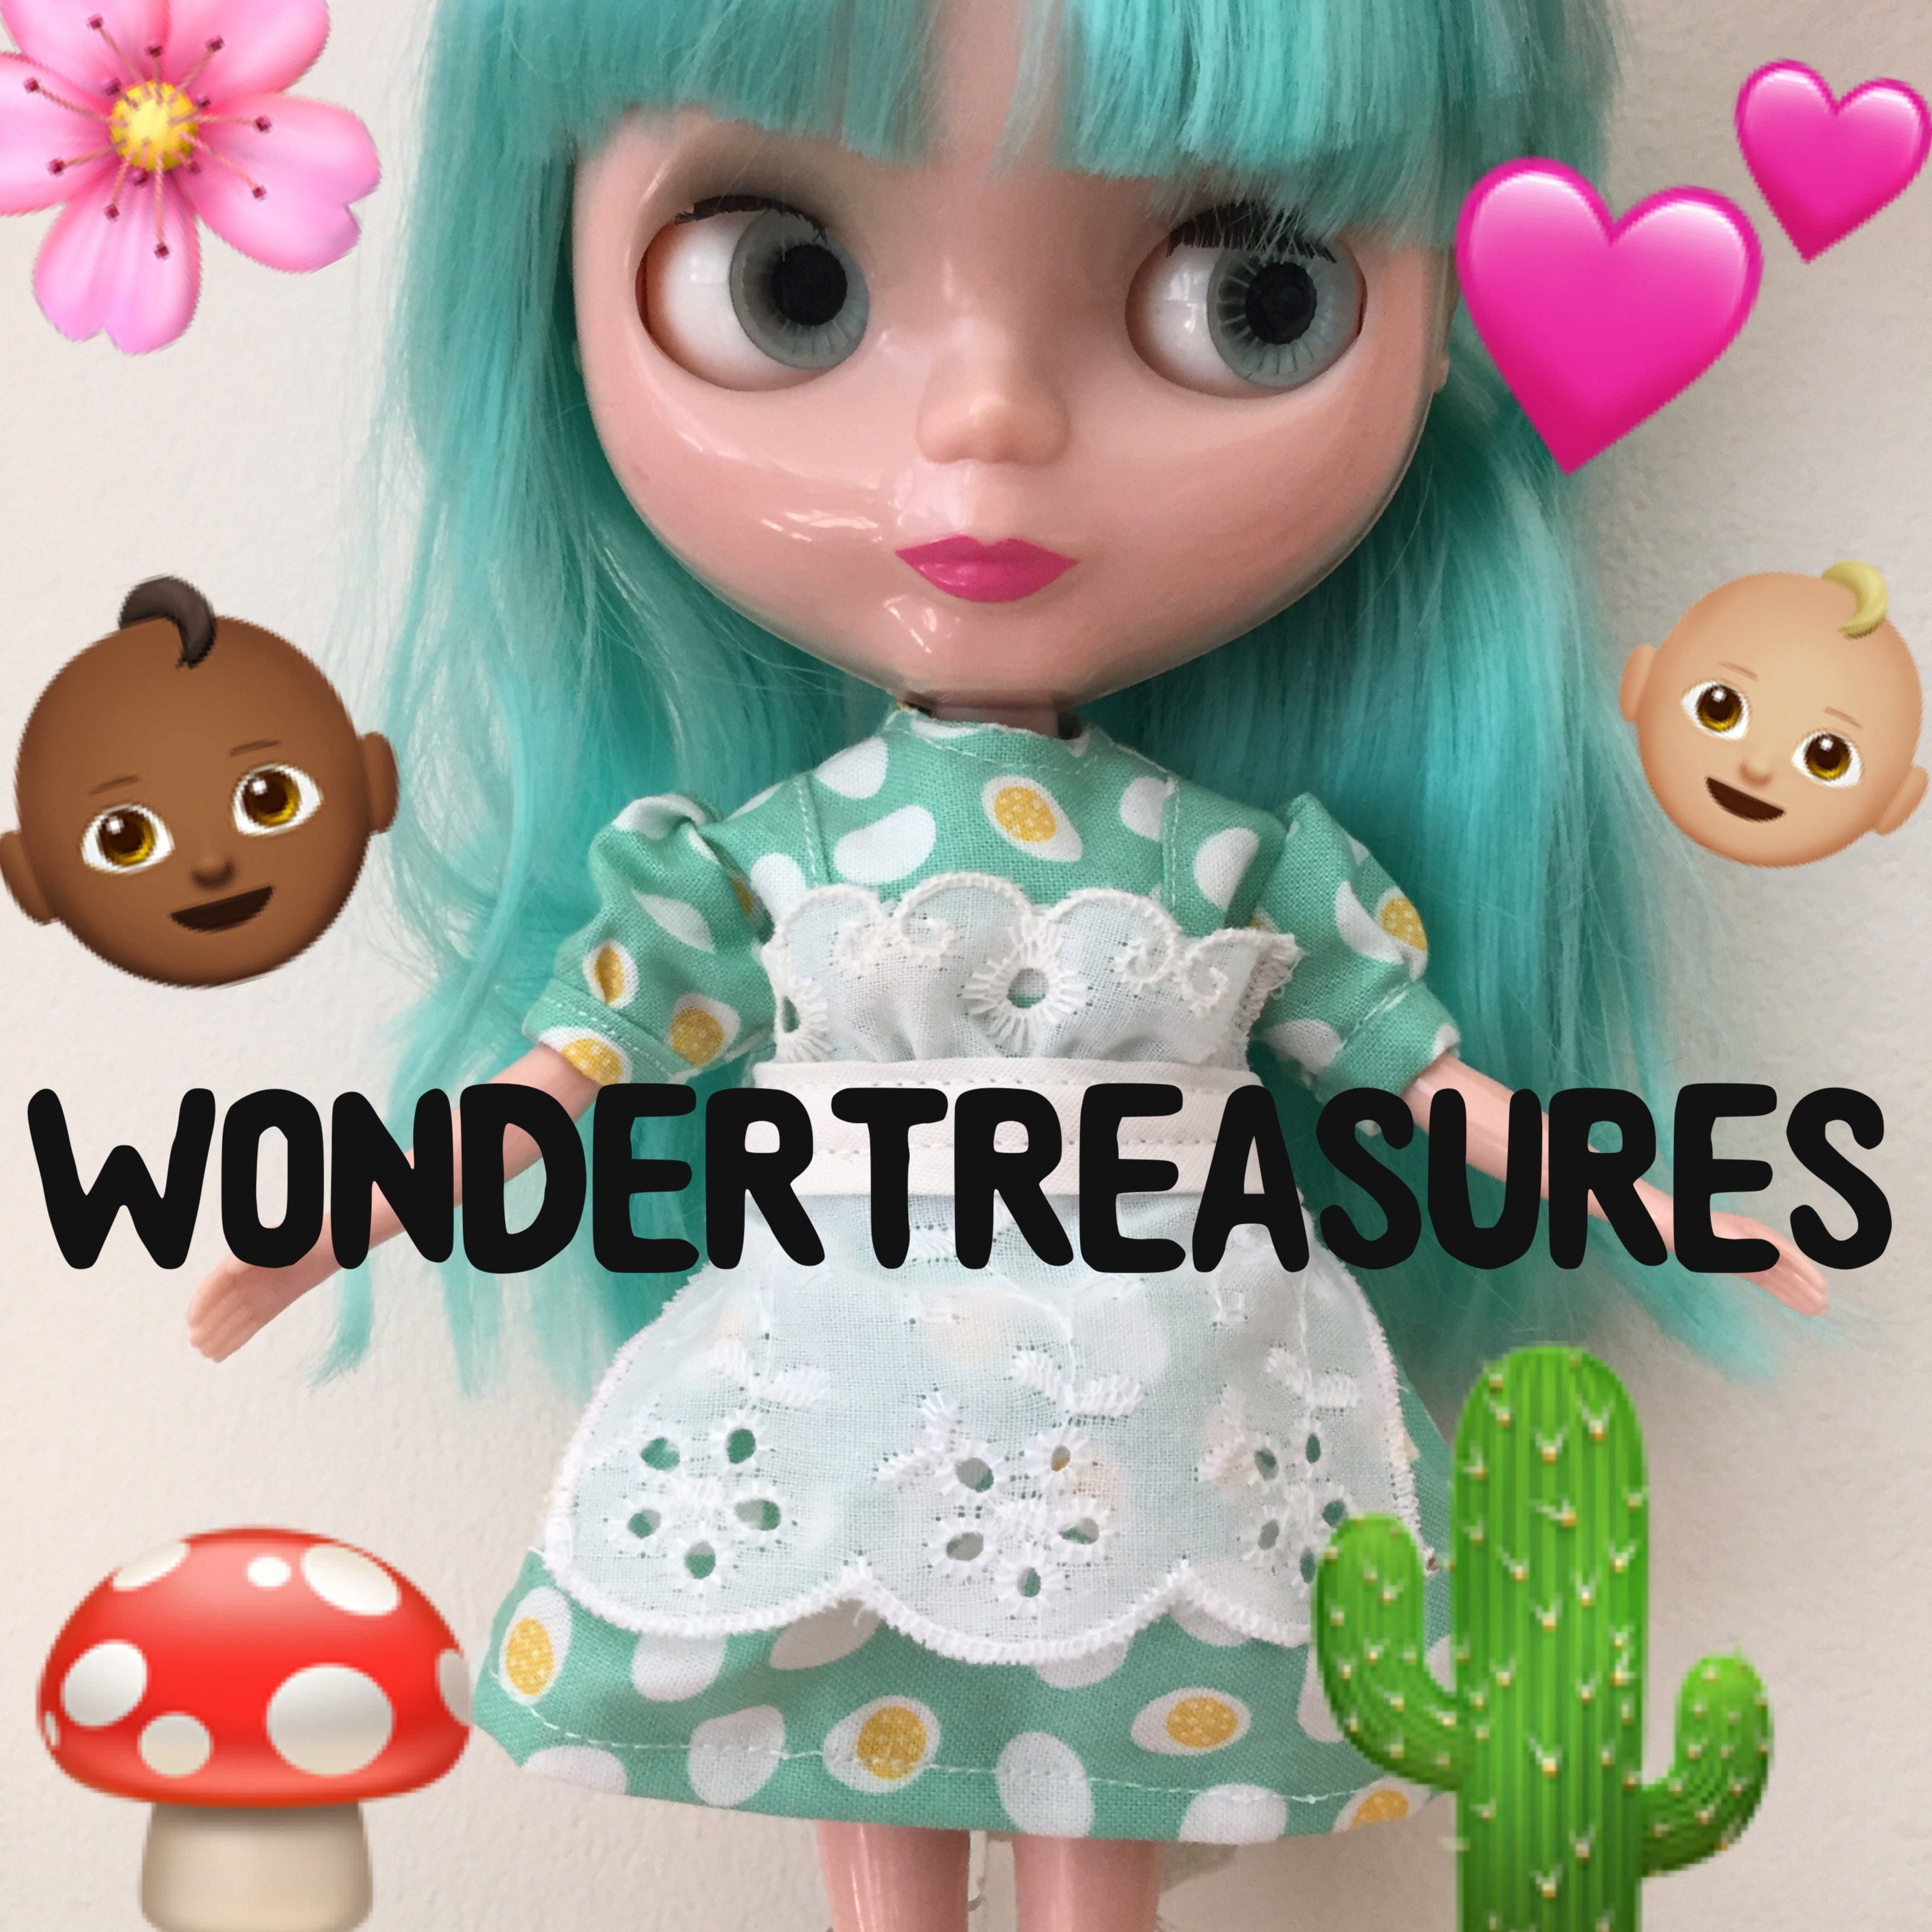 WonderTreasures